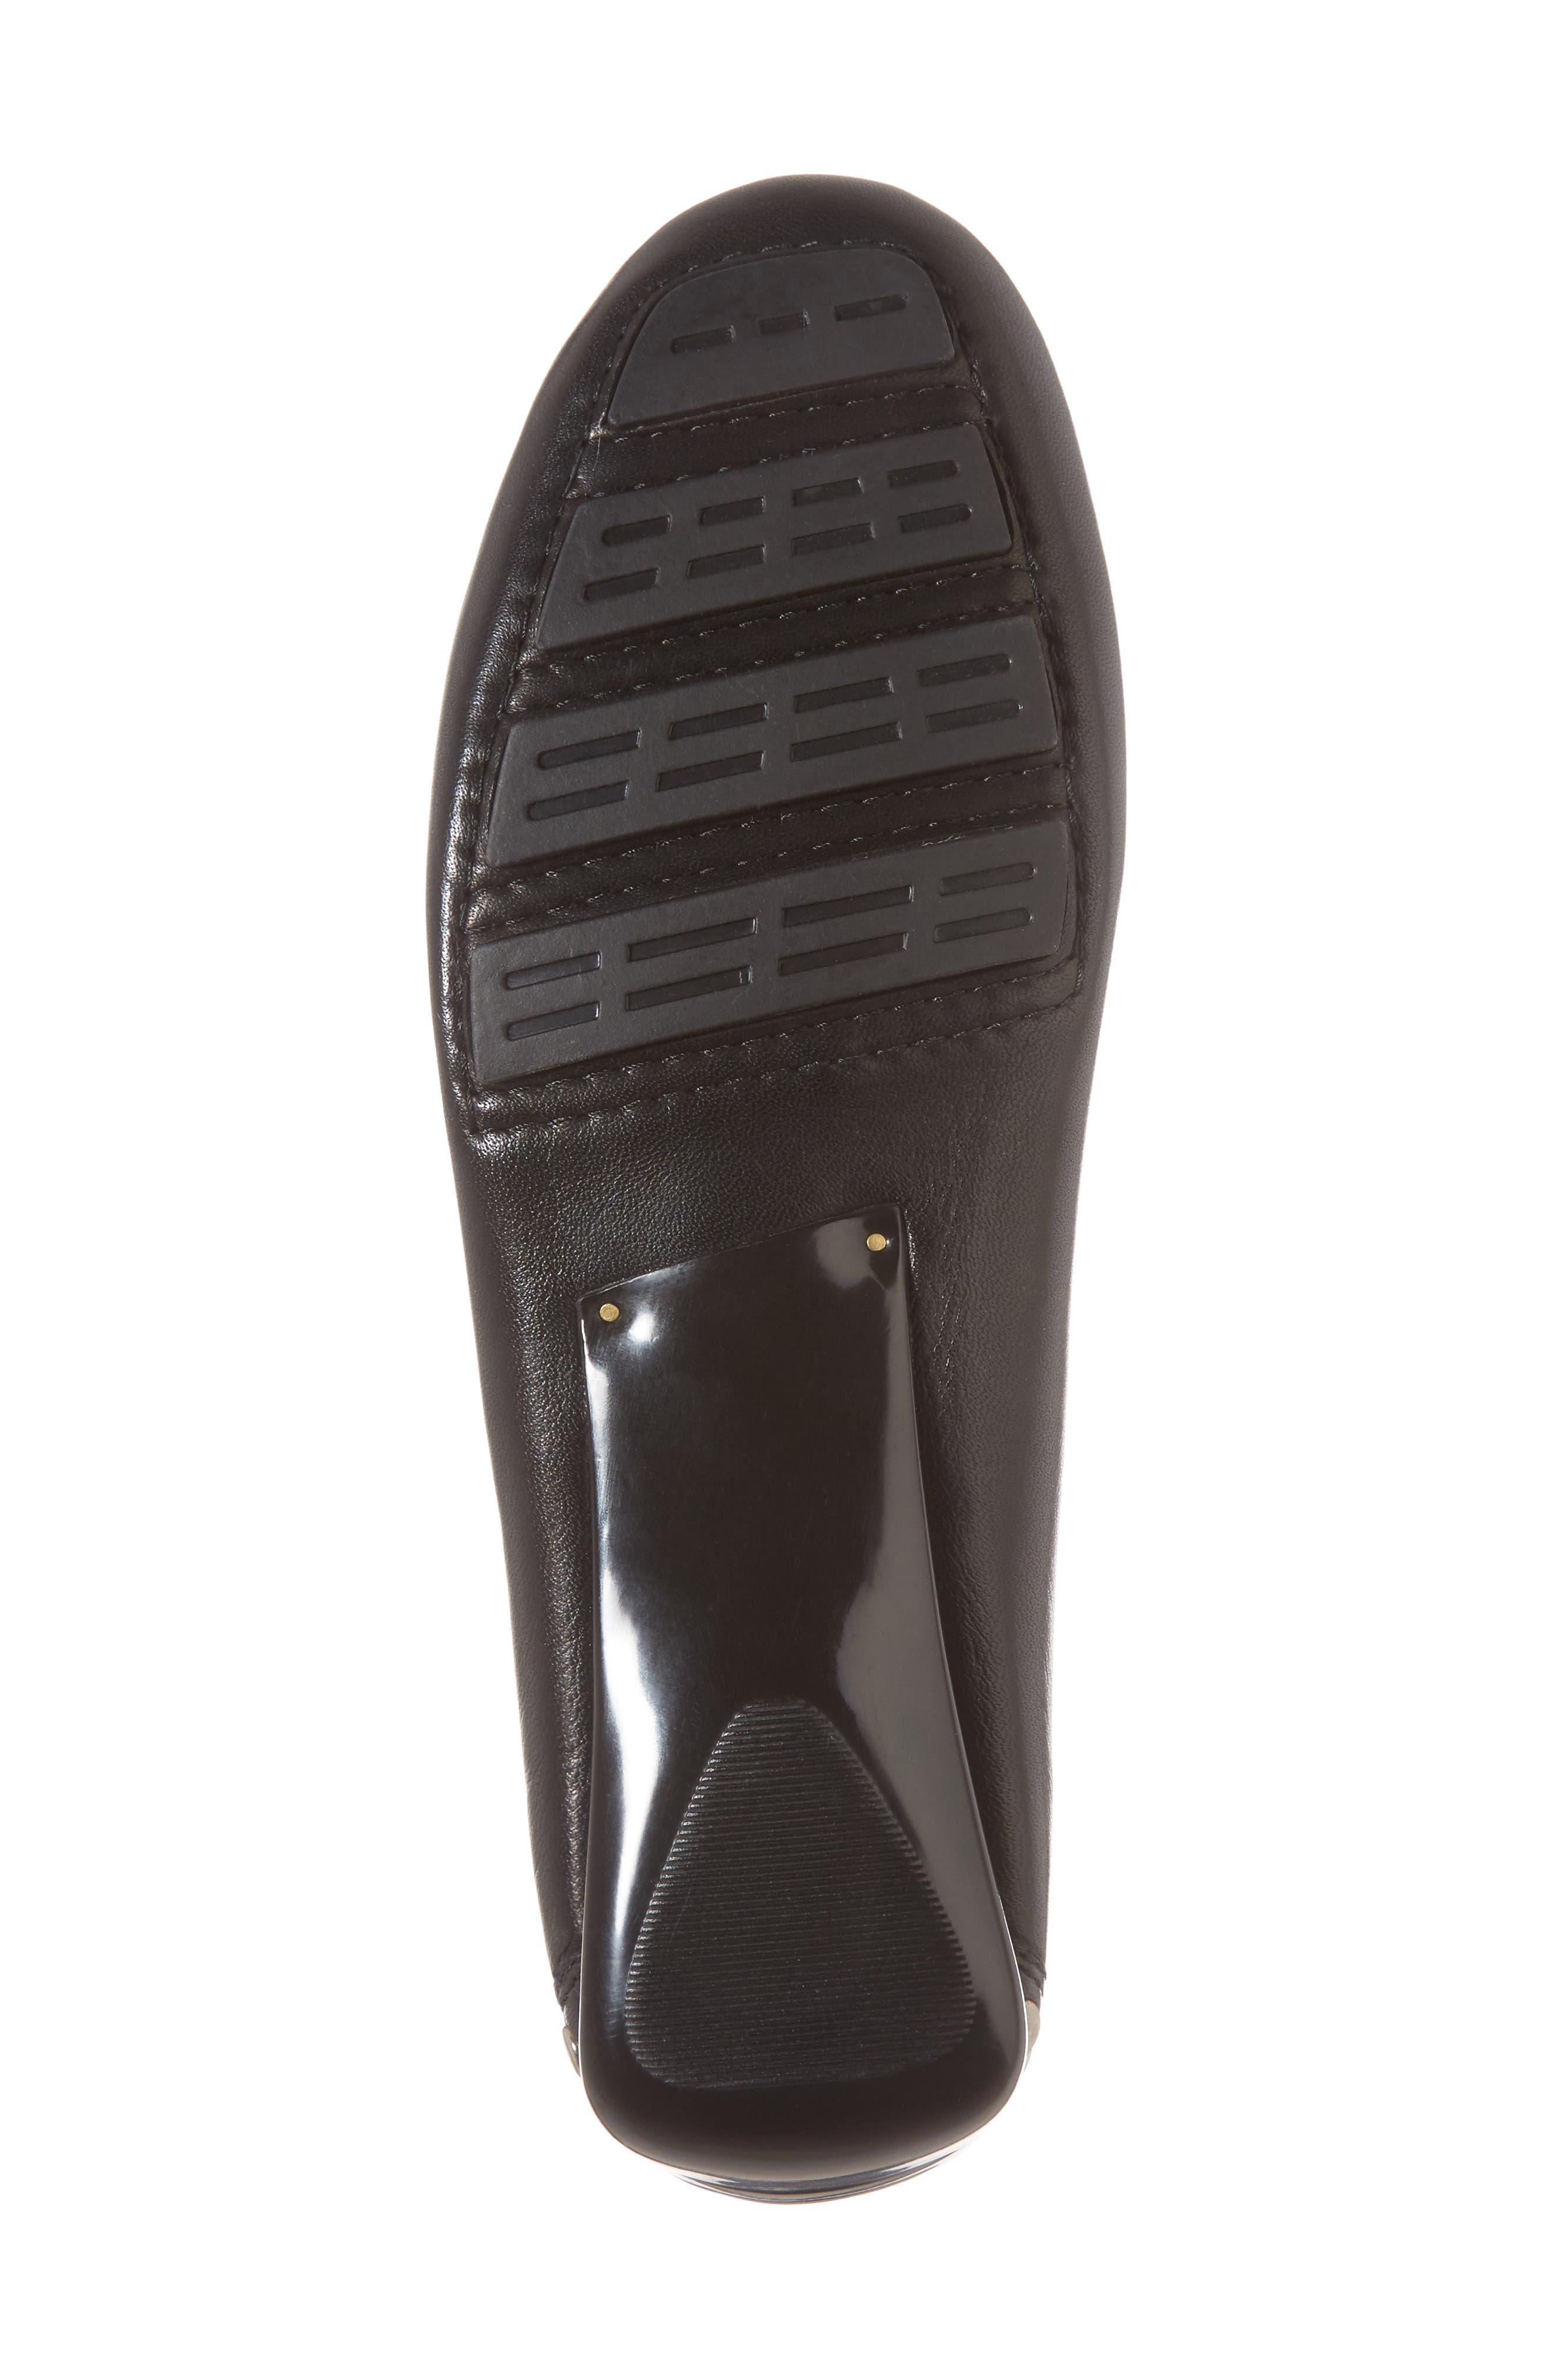 Tinae Studded Loafer,                             Alternate thumbnail 6, color,                             Black Leather